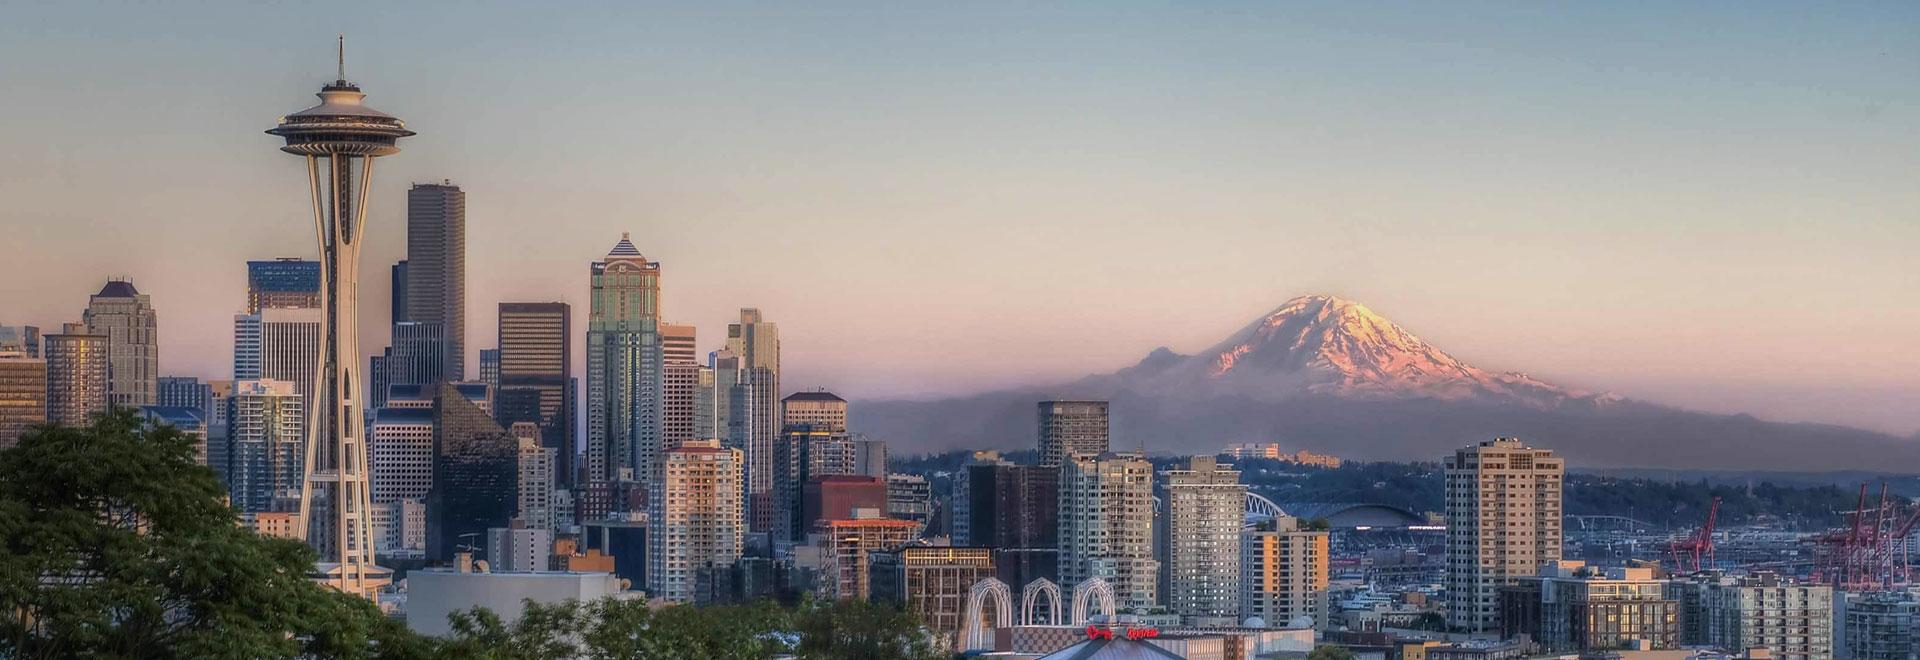 Seattle, Washington Hard Drive, RAID, And Mobile Data Recovery